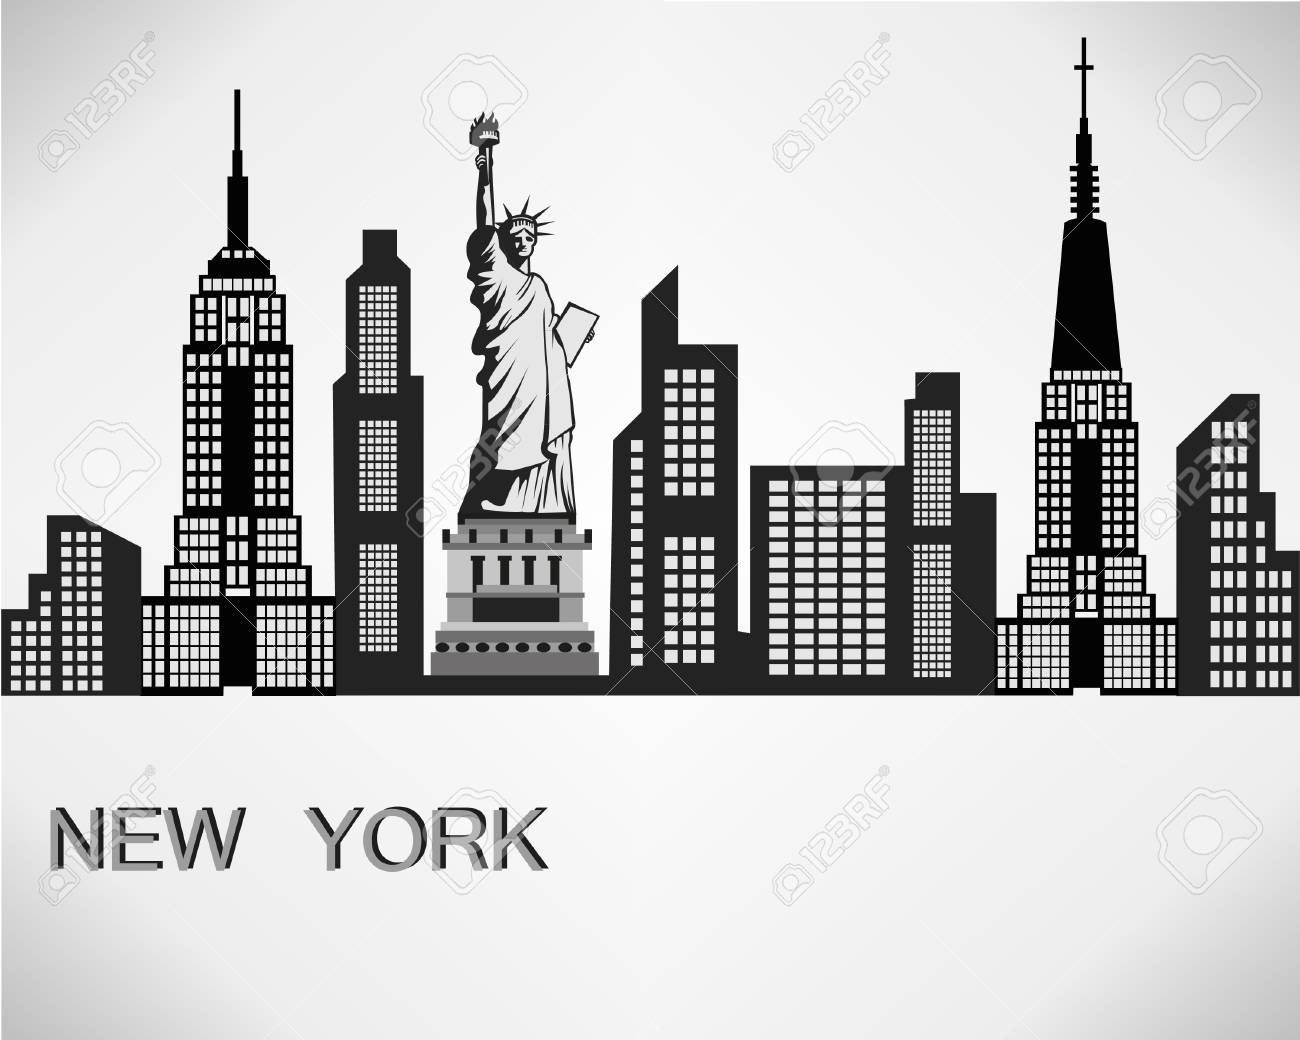 new york city skyline detailed silhouette vector illustration rh 123rf com new york skyline silhouette vector free new york skyline silhouette vector free